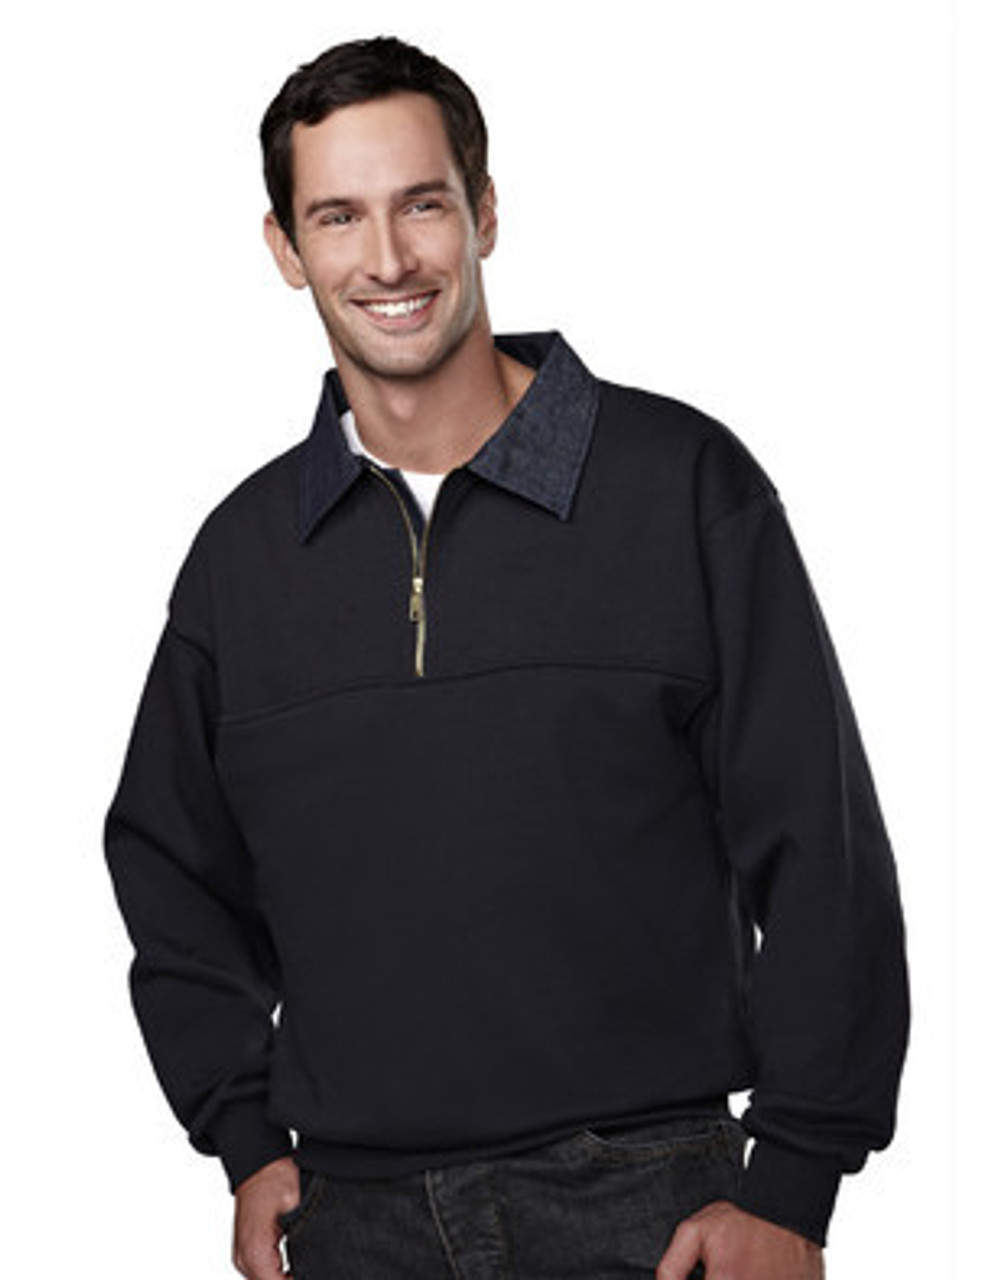 645-Alert: Job Shirt 1/4 Zip with Denim Collar by Tri-Mountain